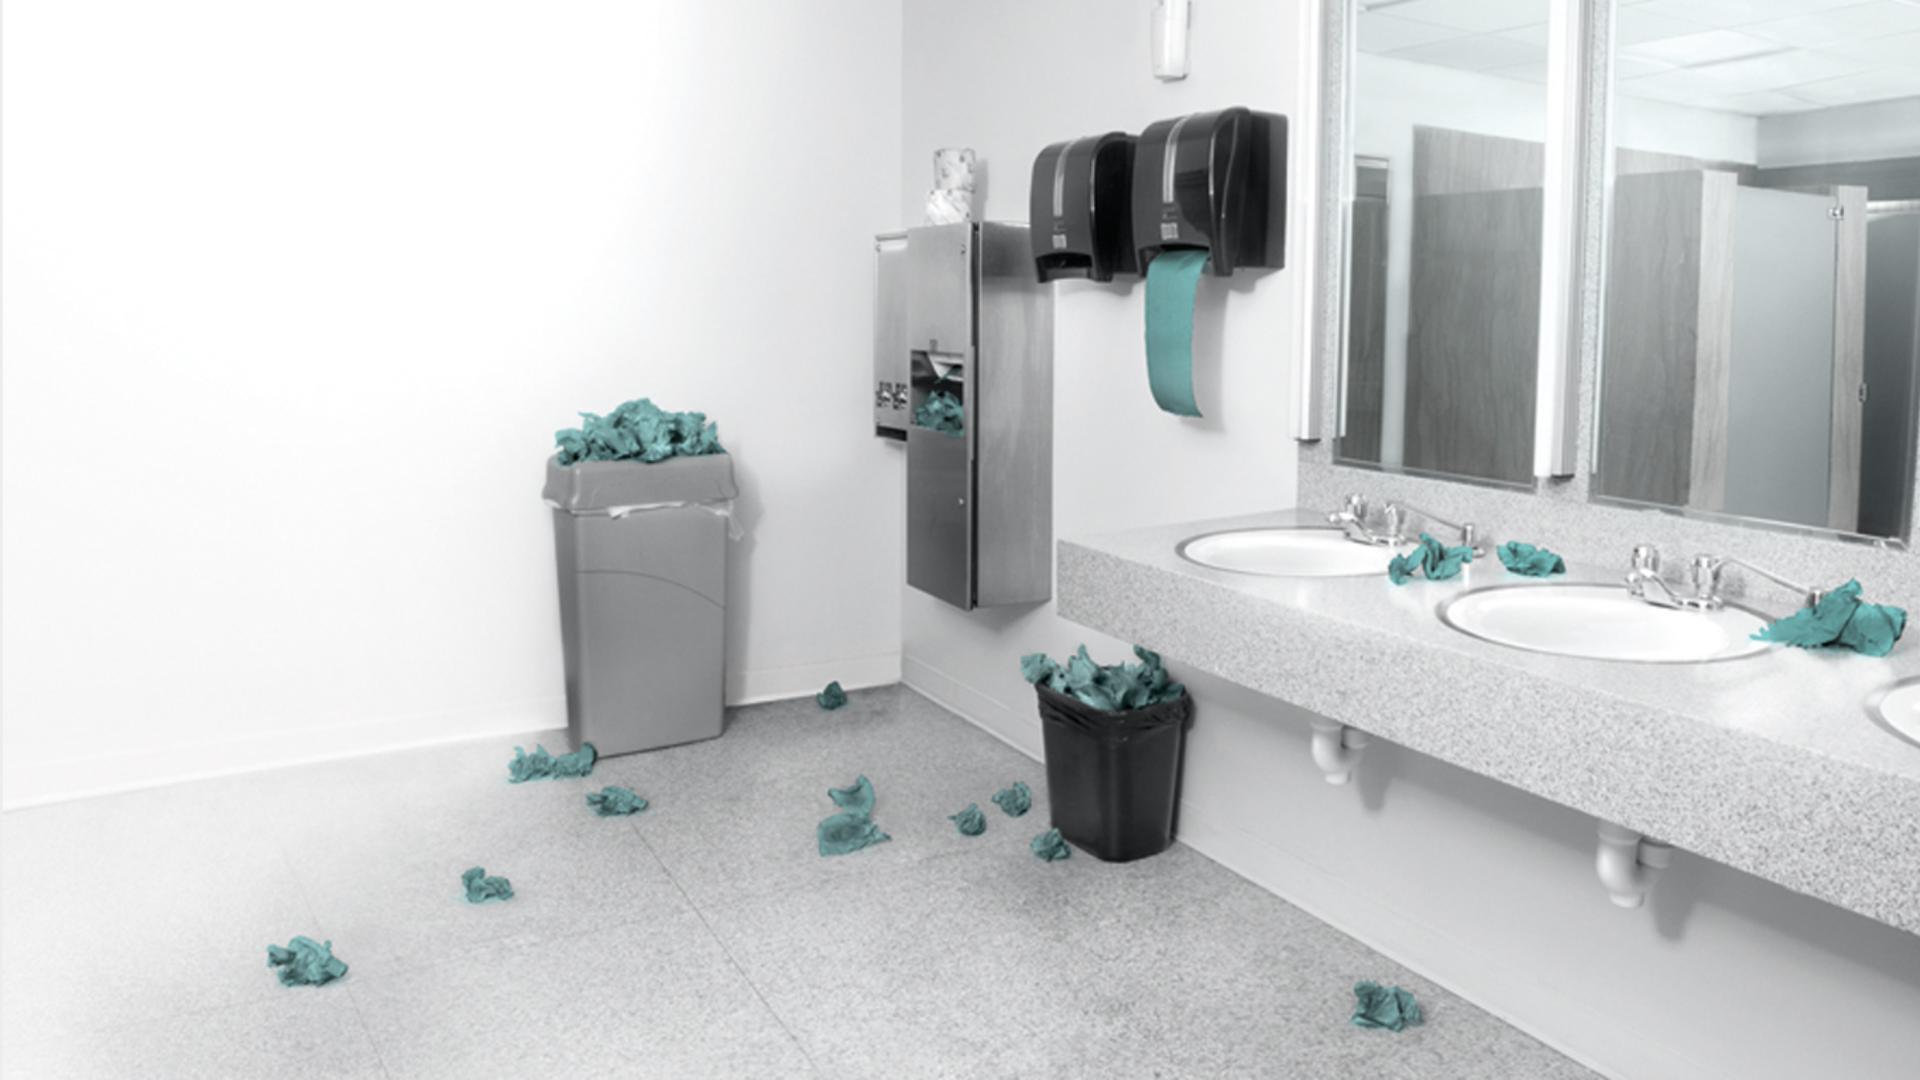 حمام مليء بالفوضى